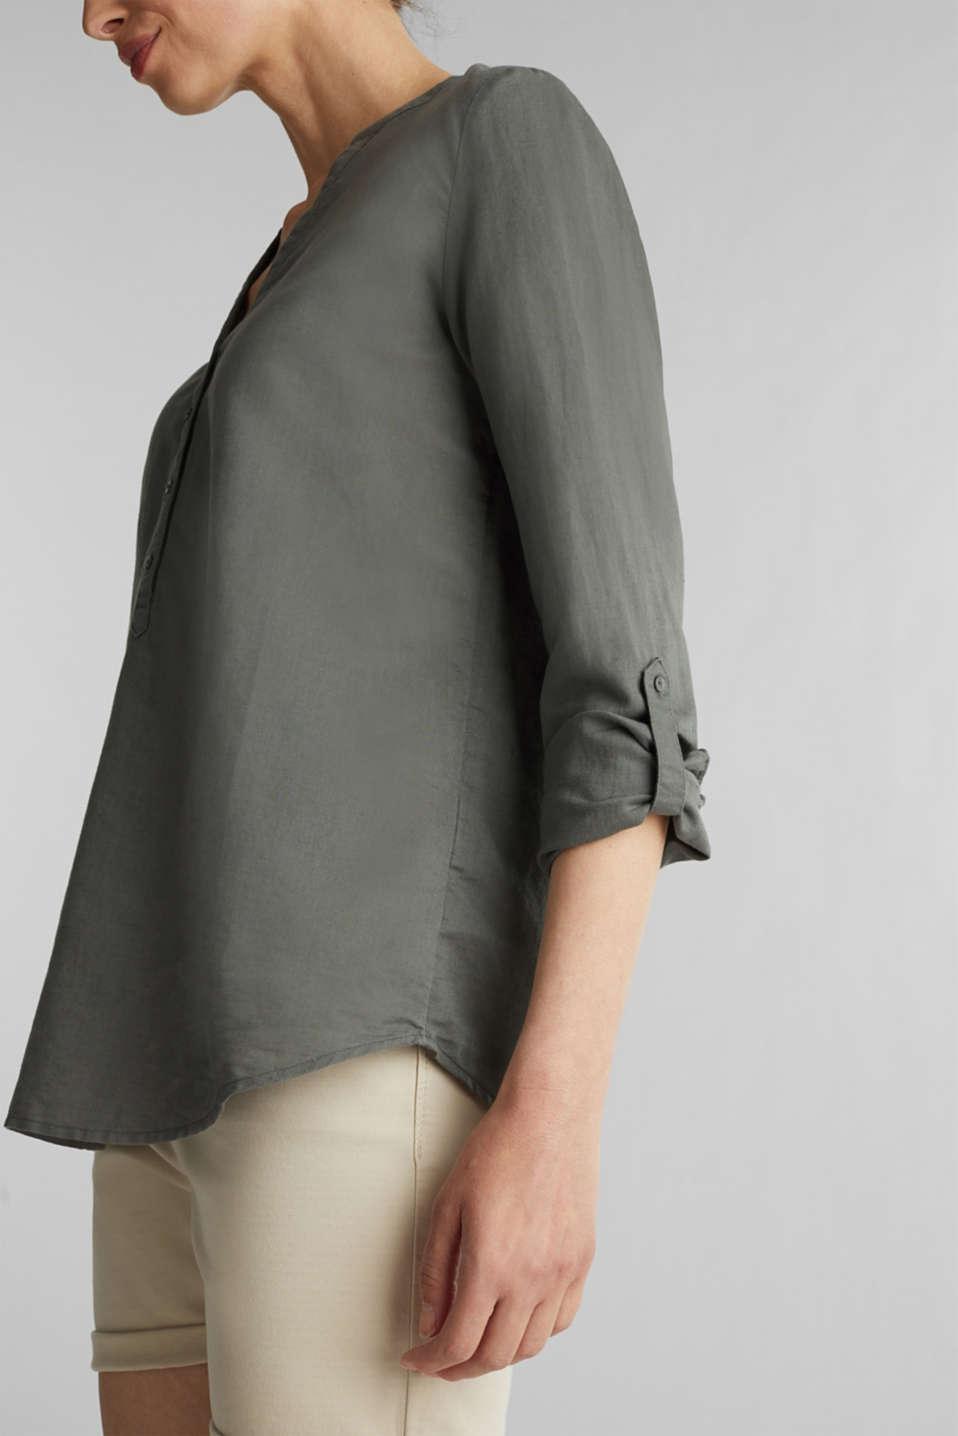 Turn-up blouse in blended linen, KHAKI GREEN, detail image number 2